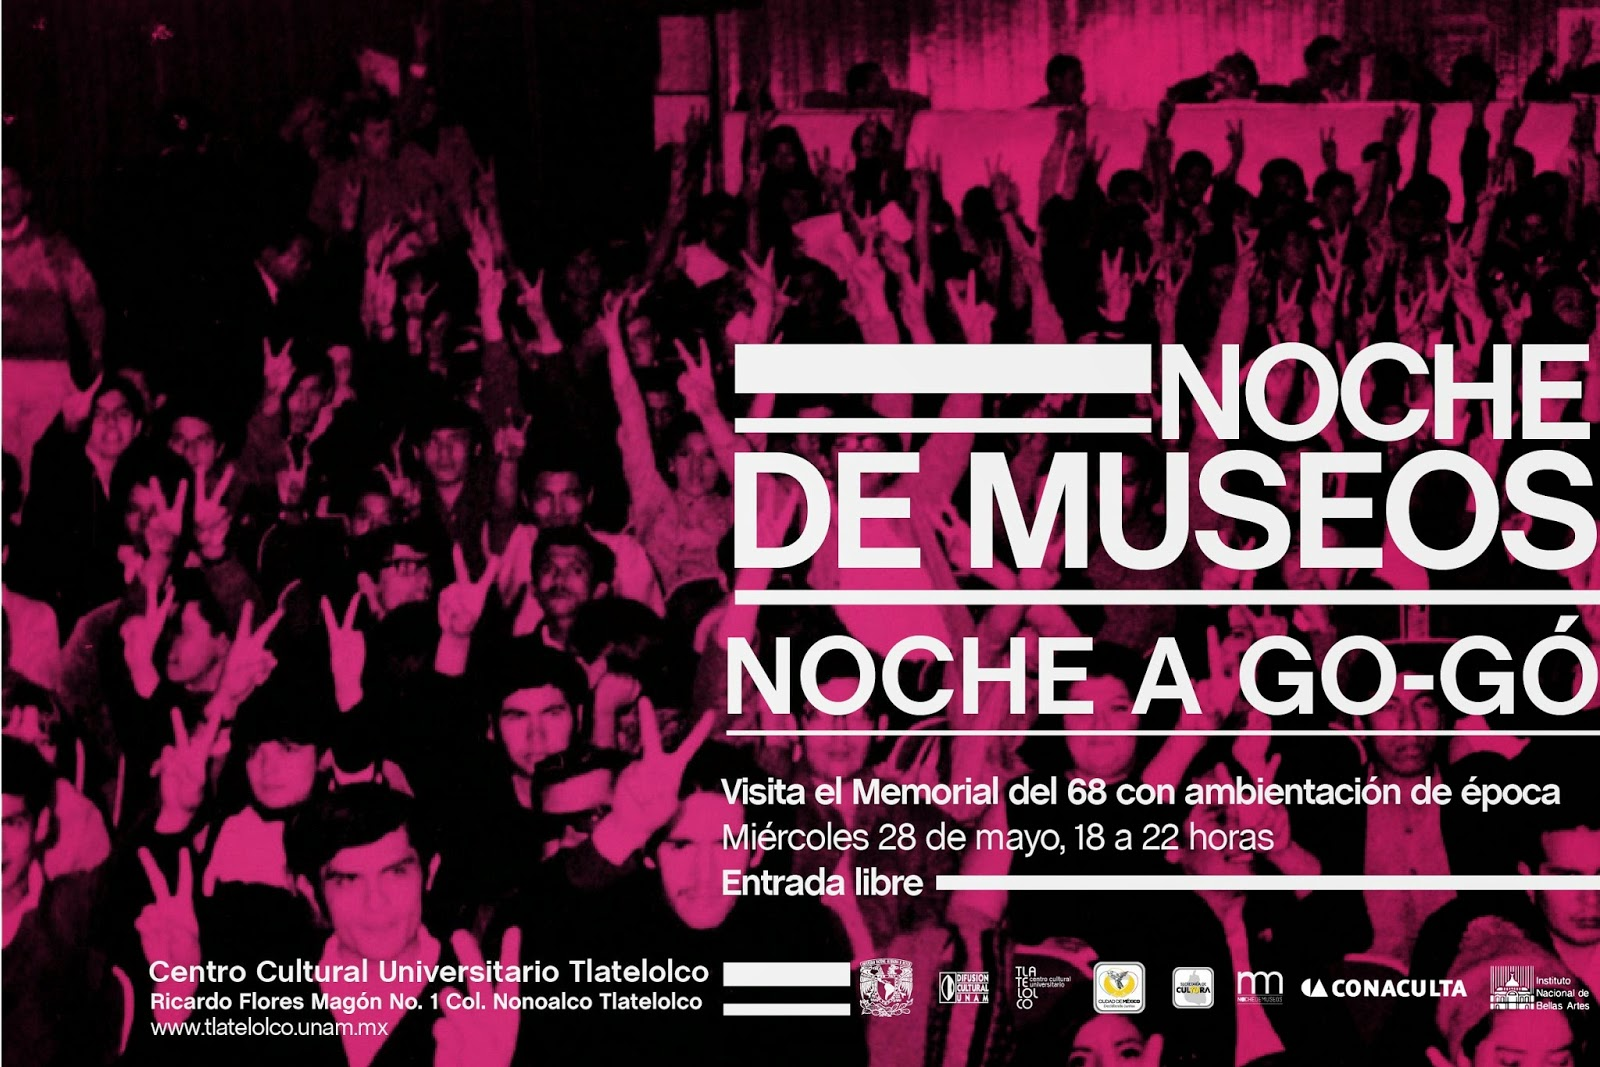 Noche de Museos a Go-Gó en Tlatelolco